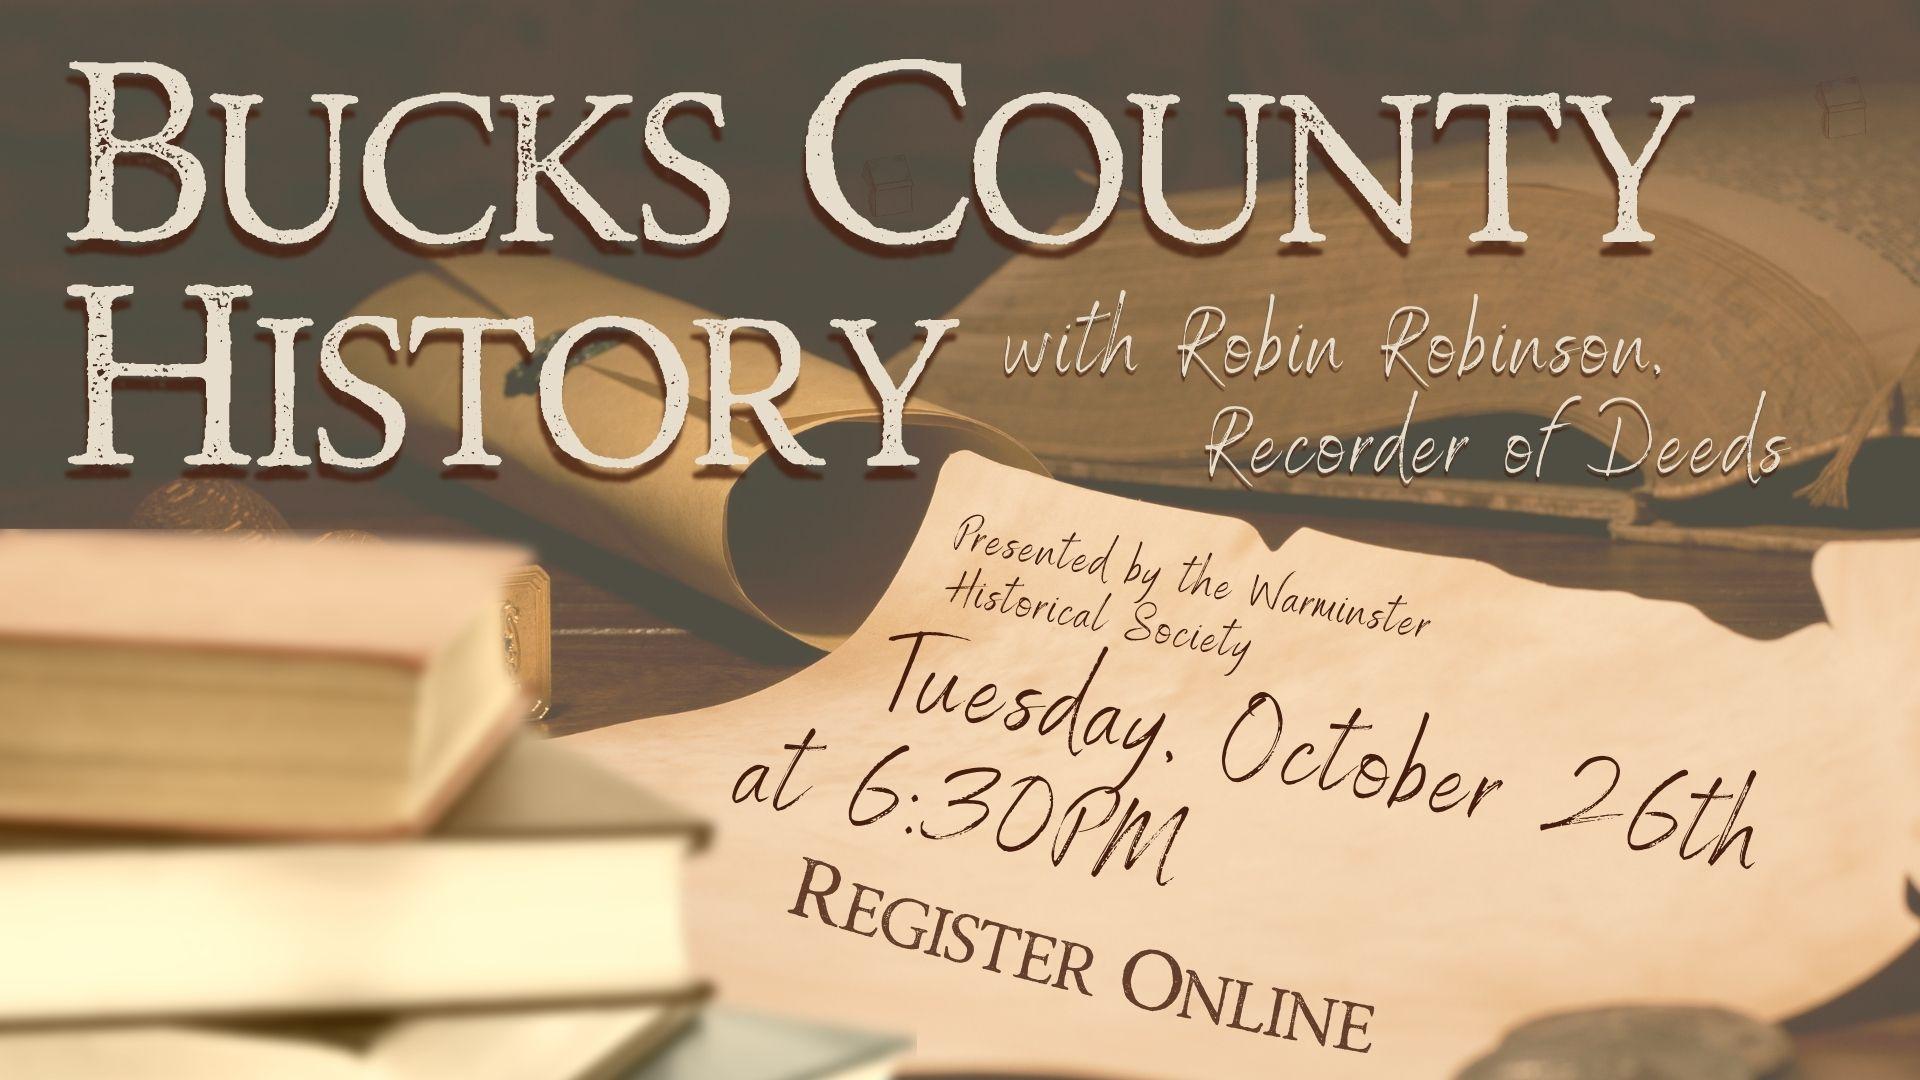 Bucks County History with Recorder of Deeds, Robin Robinson